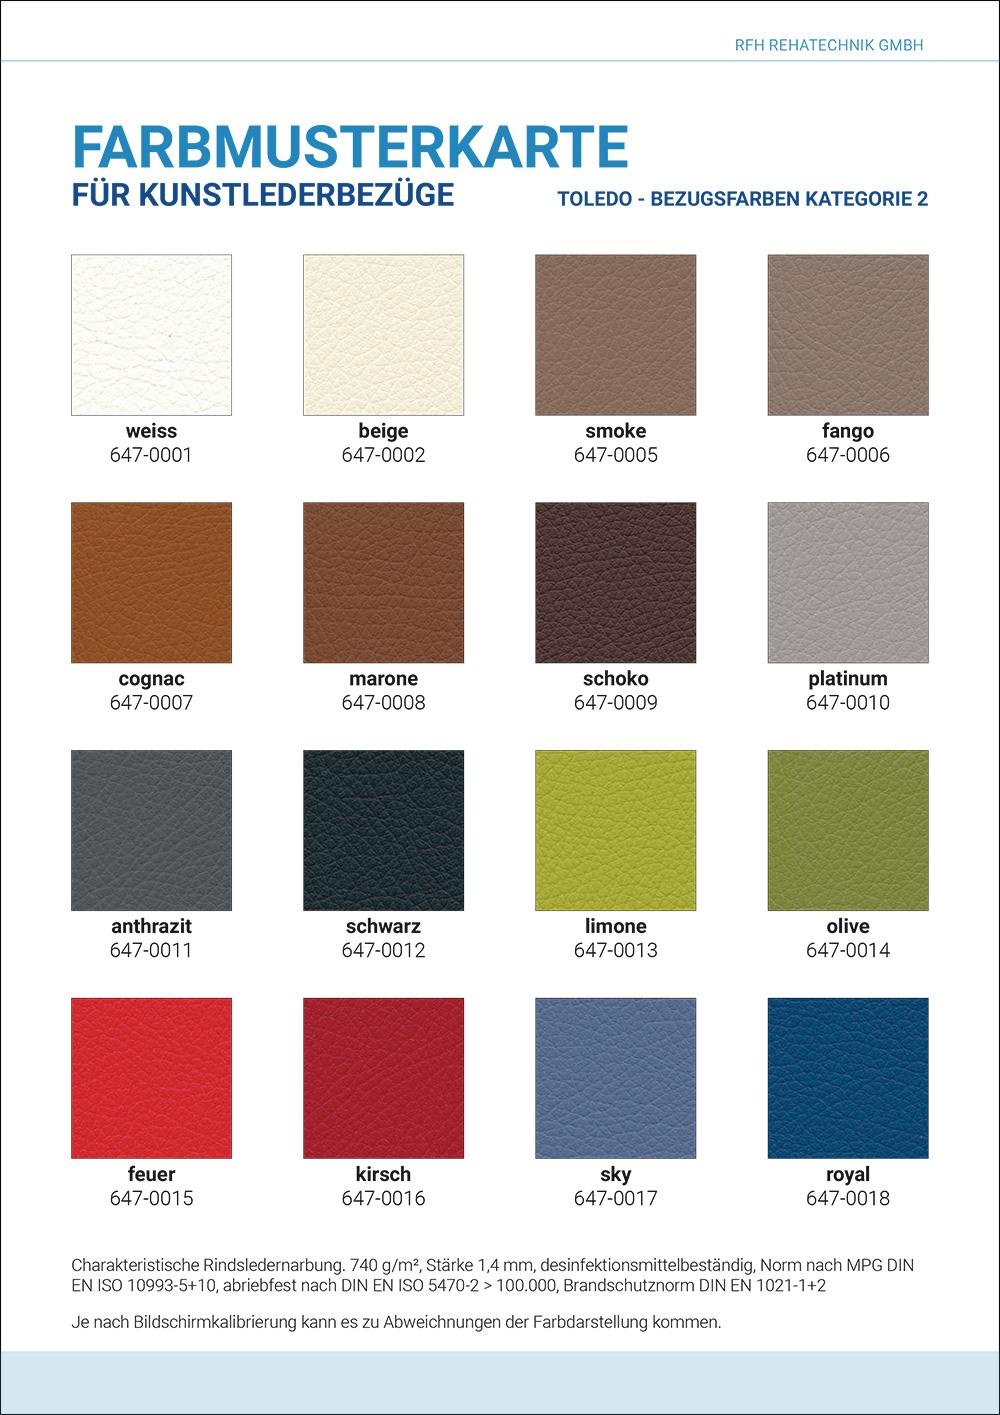 Farbmusterkarte